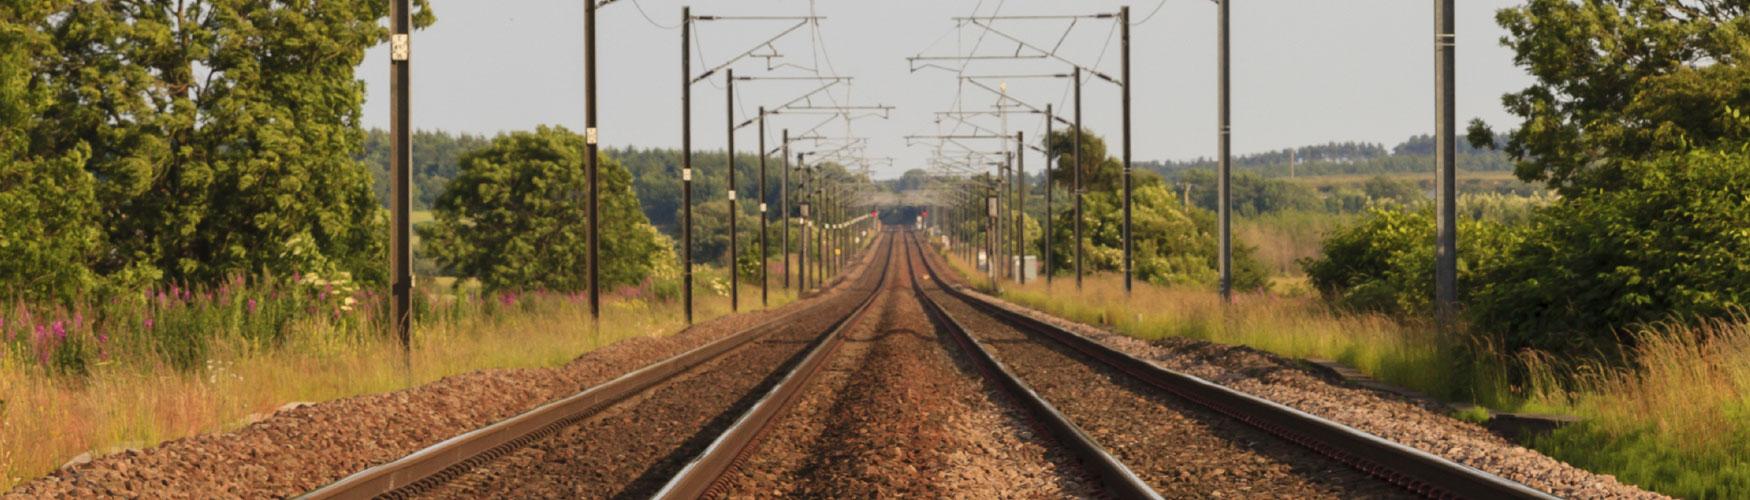 railway-header.jpg